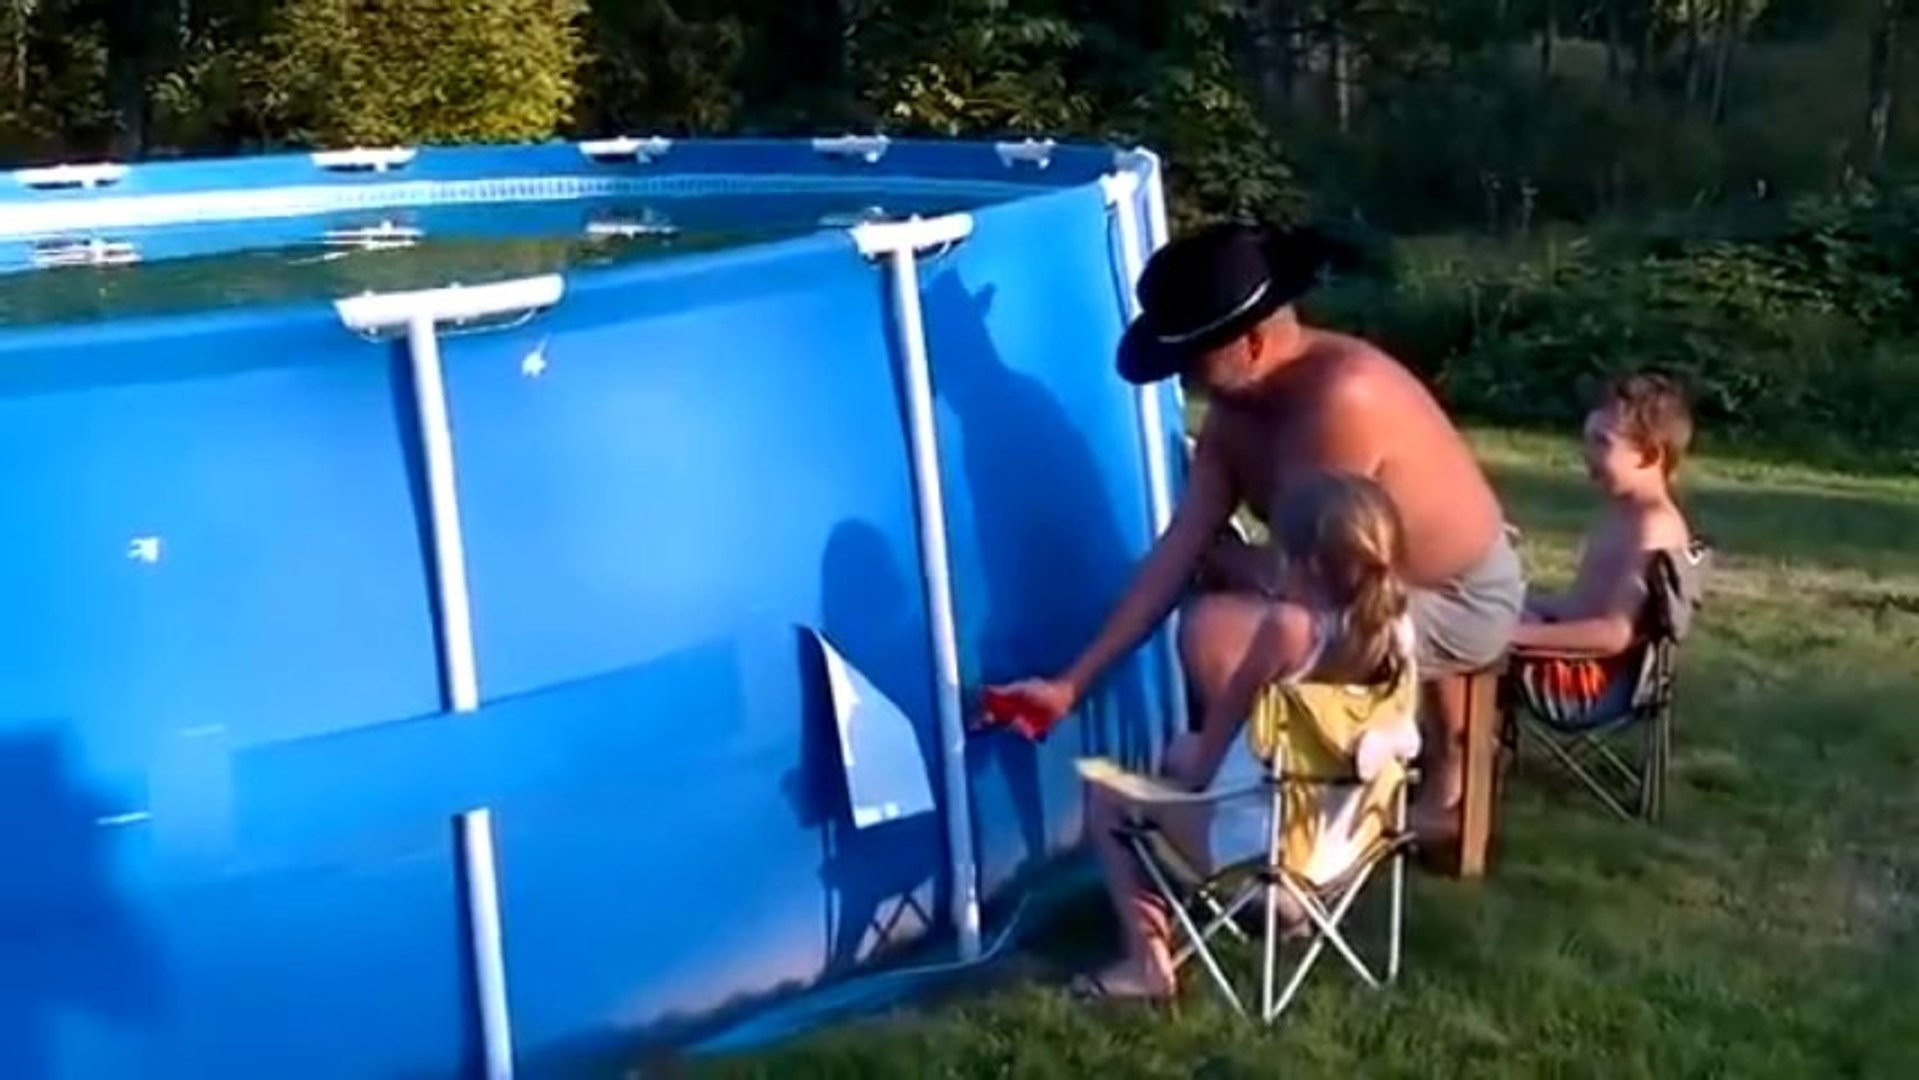 Comment vider une piscine en 10 seconde ?